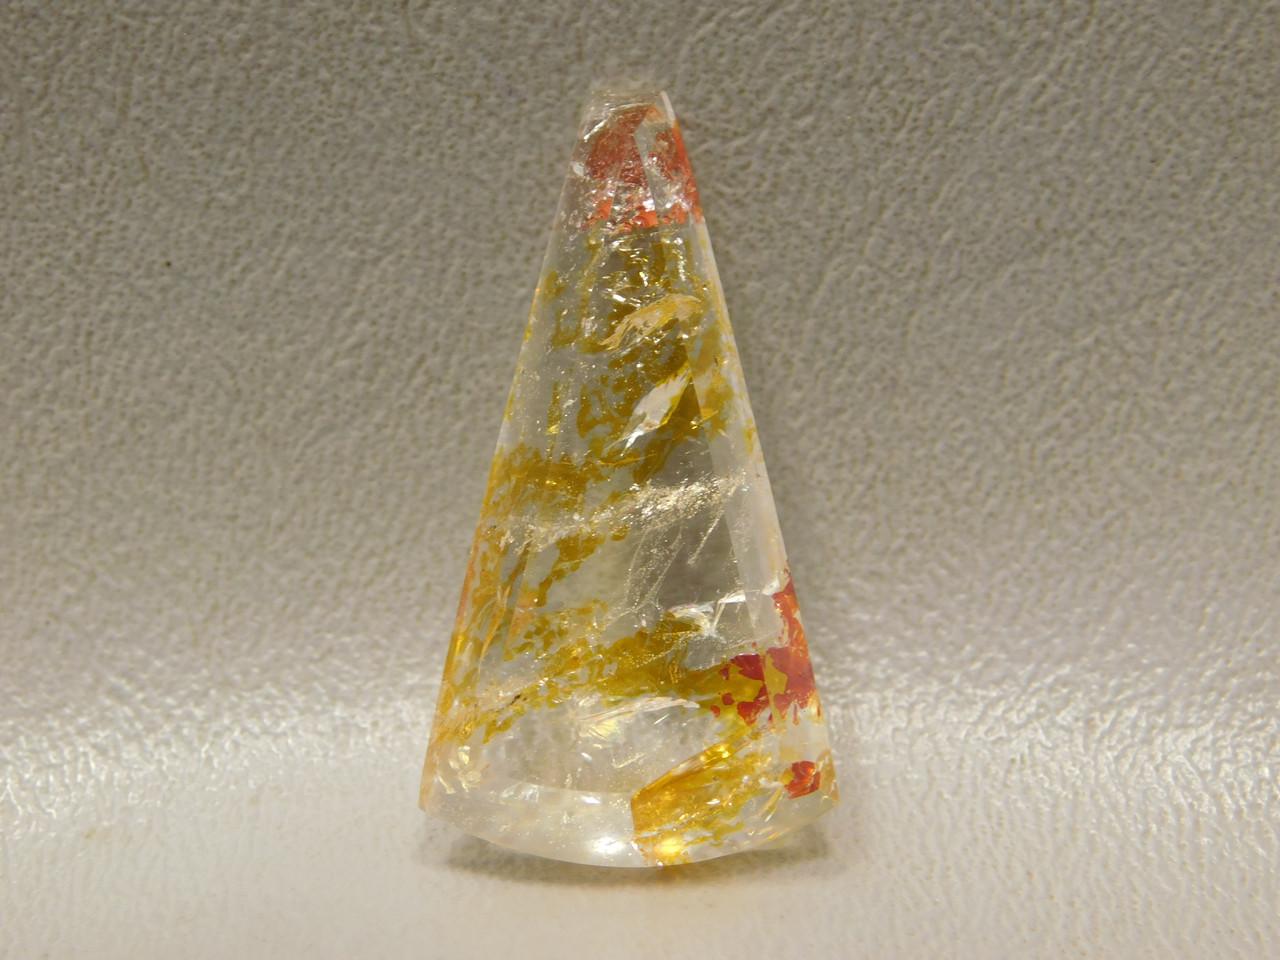 Hematoid Quartz with Inclusions Crystal Gemstone Cabochon #Q9